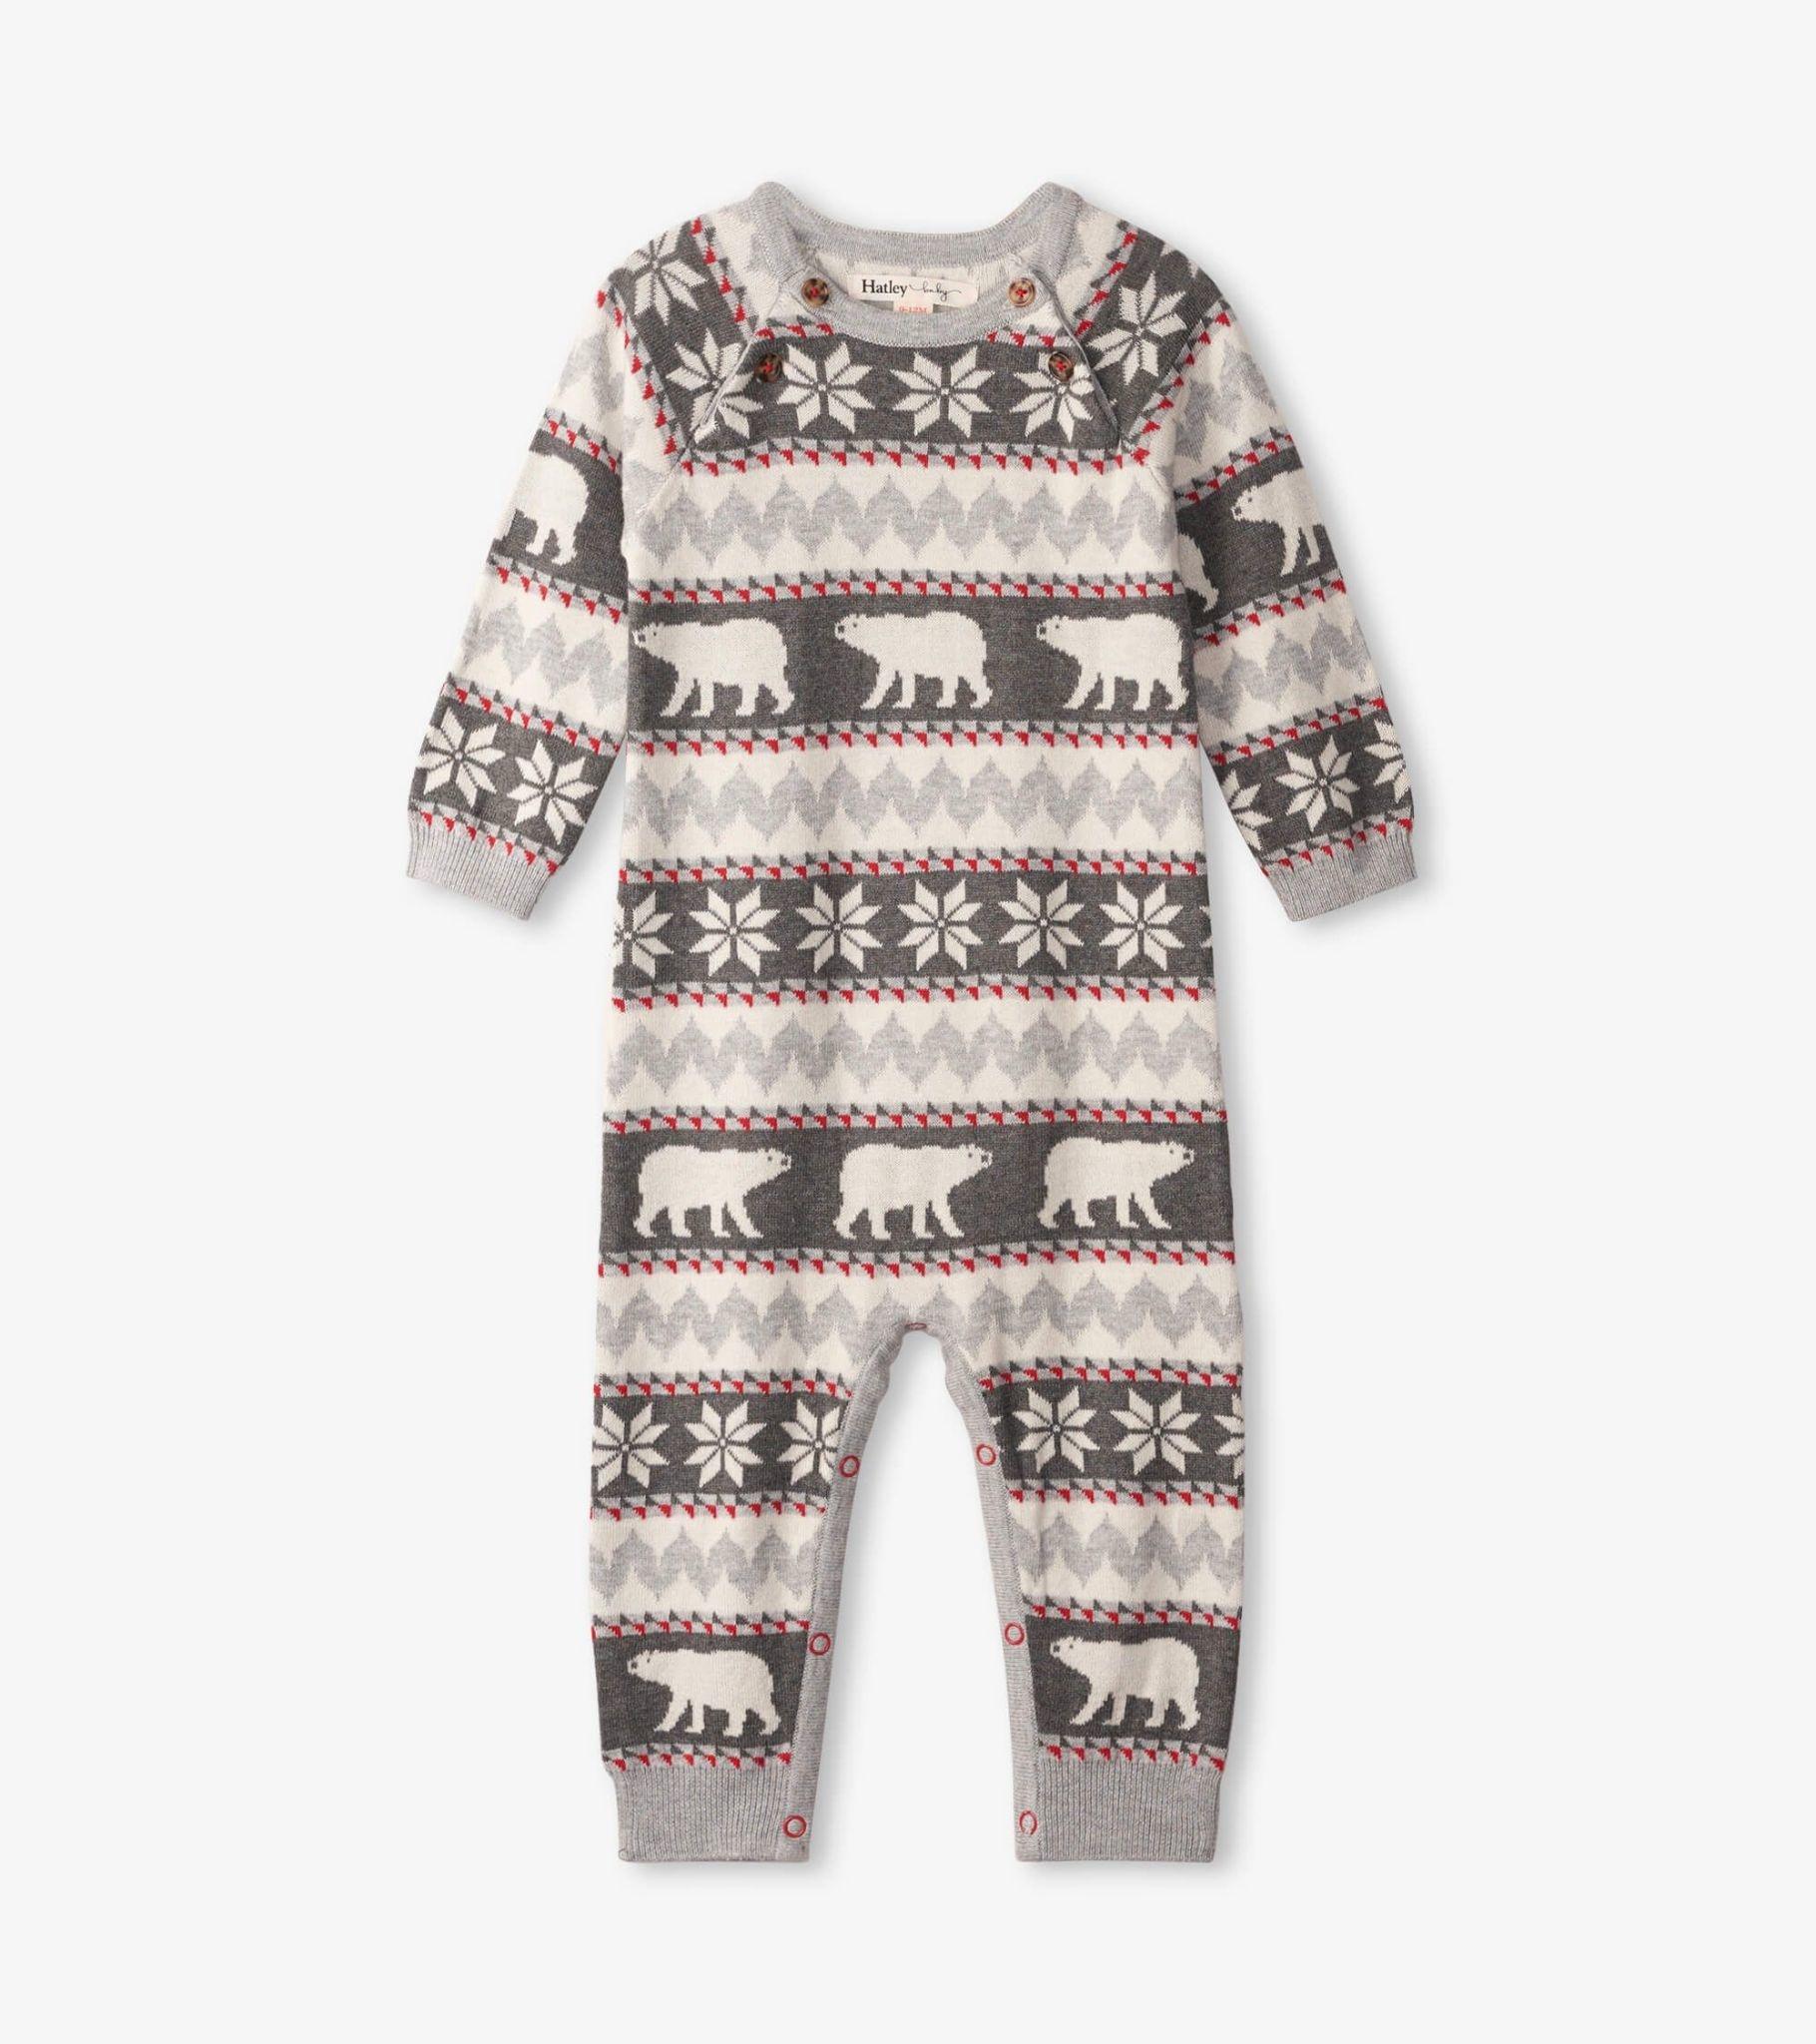 Hatley Hatley Polar Bear Fair Isle Sweater Romper